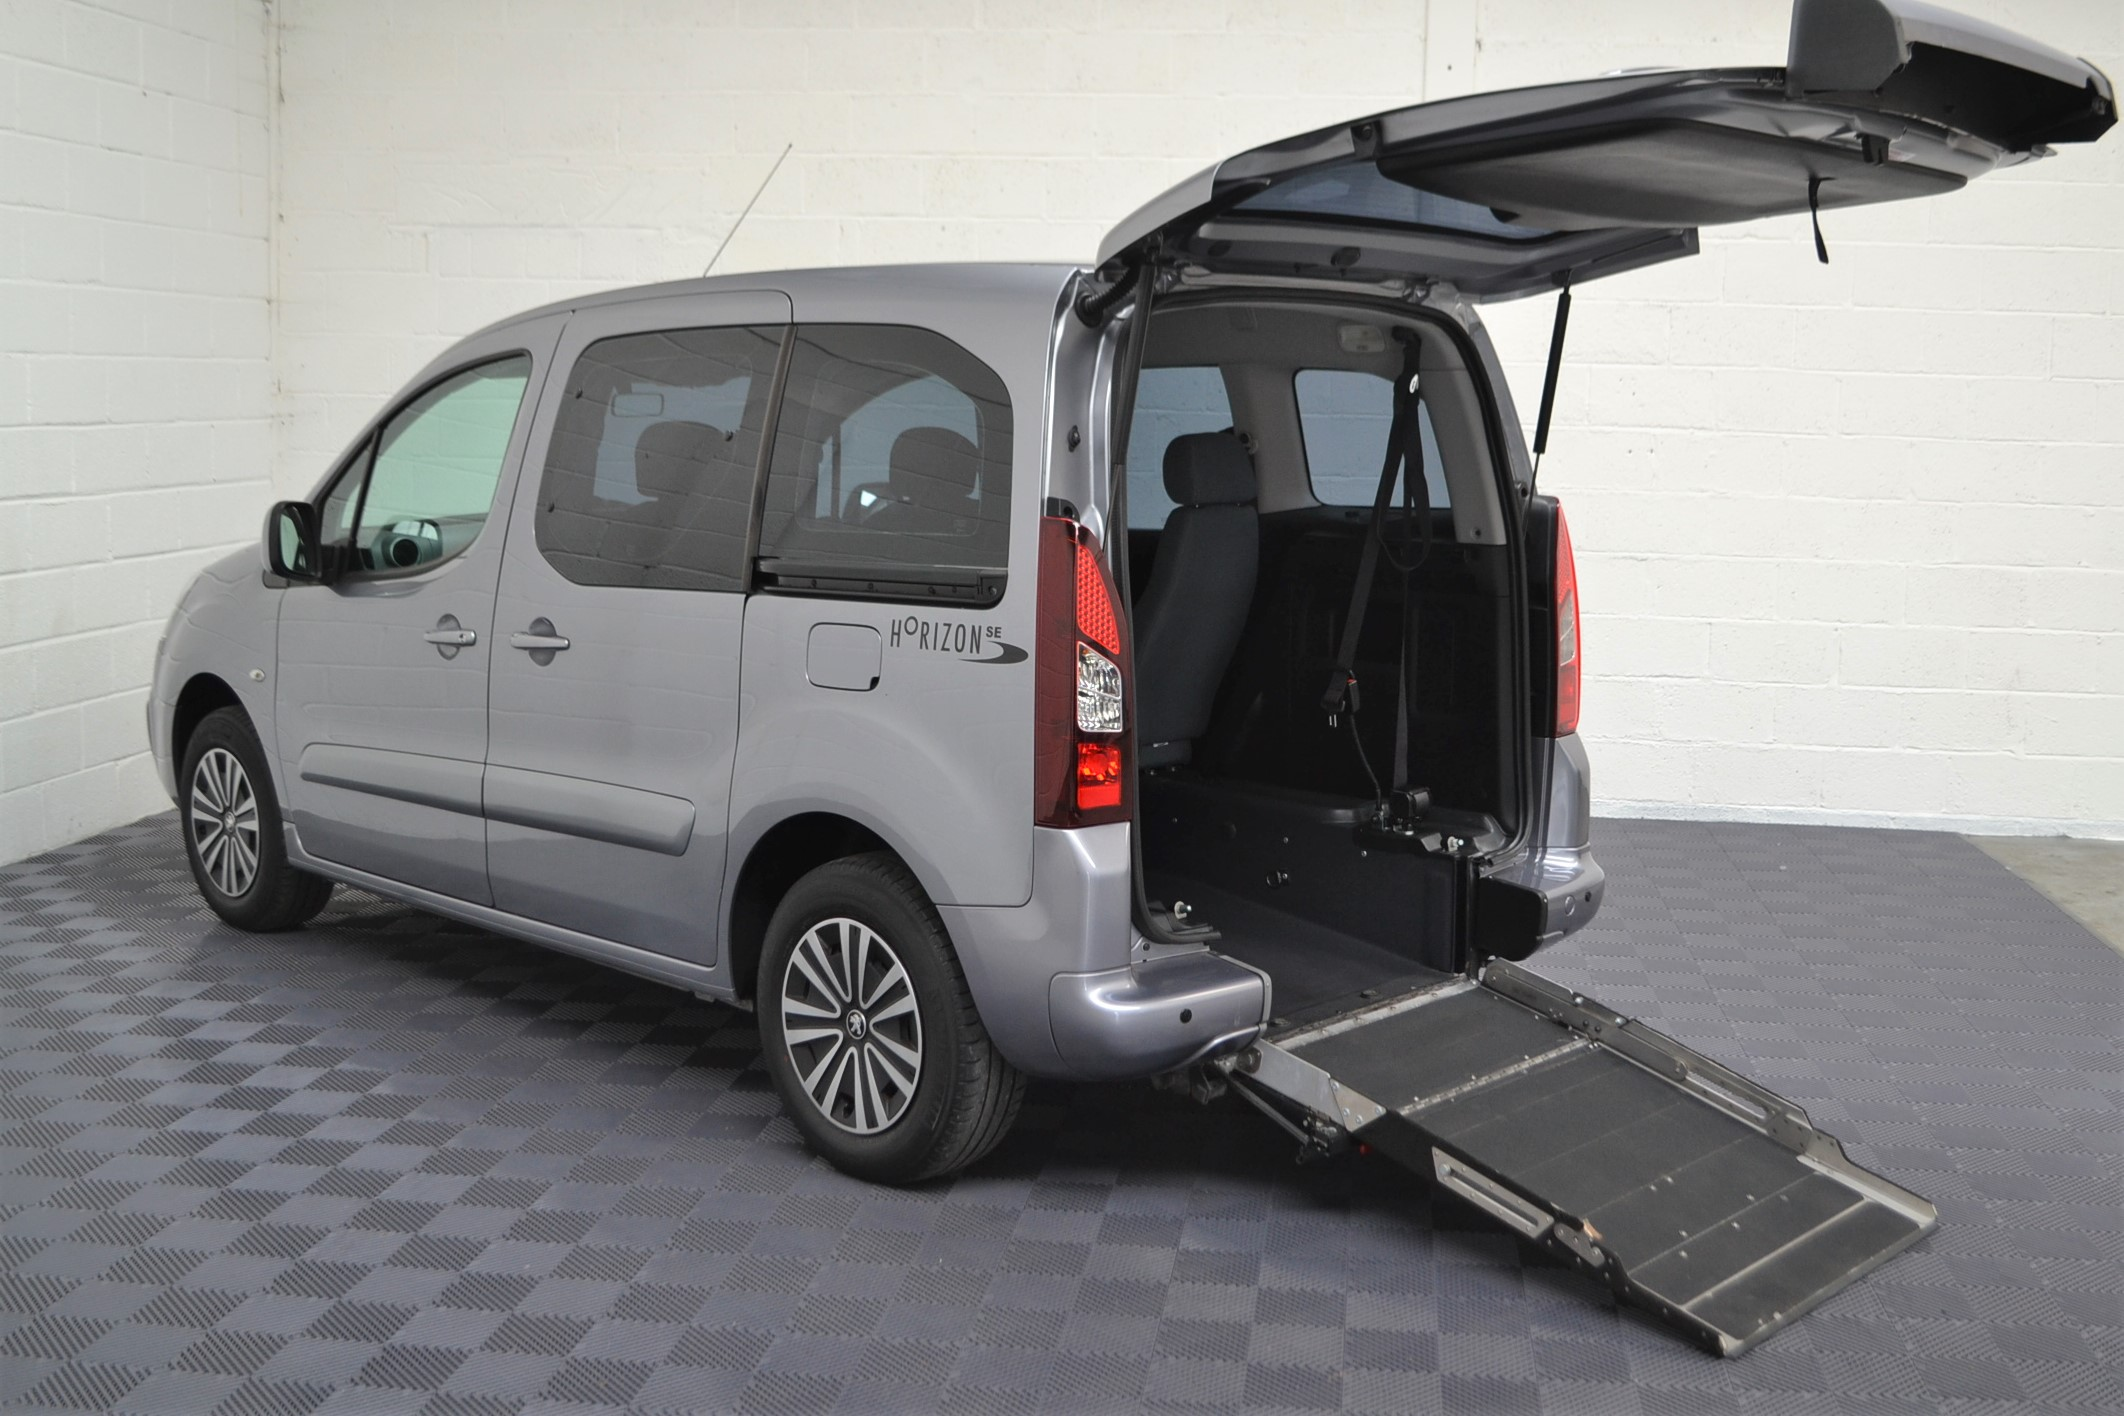 Used Wav Cars for Sale UK Citroen Berlingo WAV Car Peugeot Partner Petrol Wheelchair Accessible Vehicles Buy Sell Bristol Somerset Devon Dorset 6